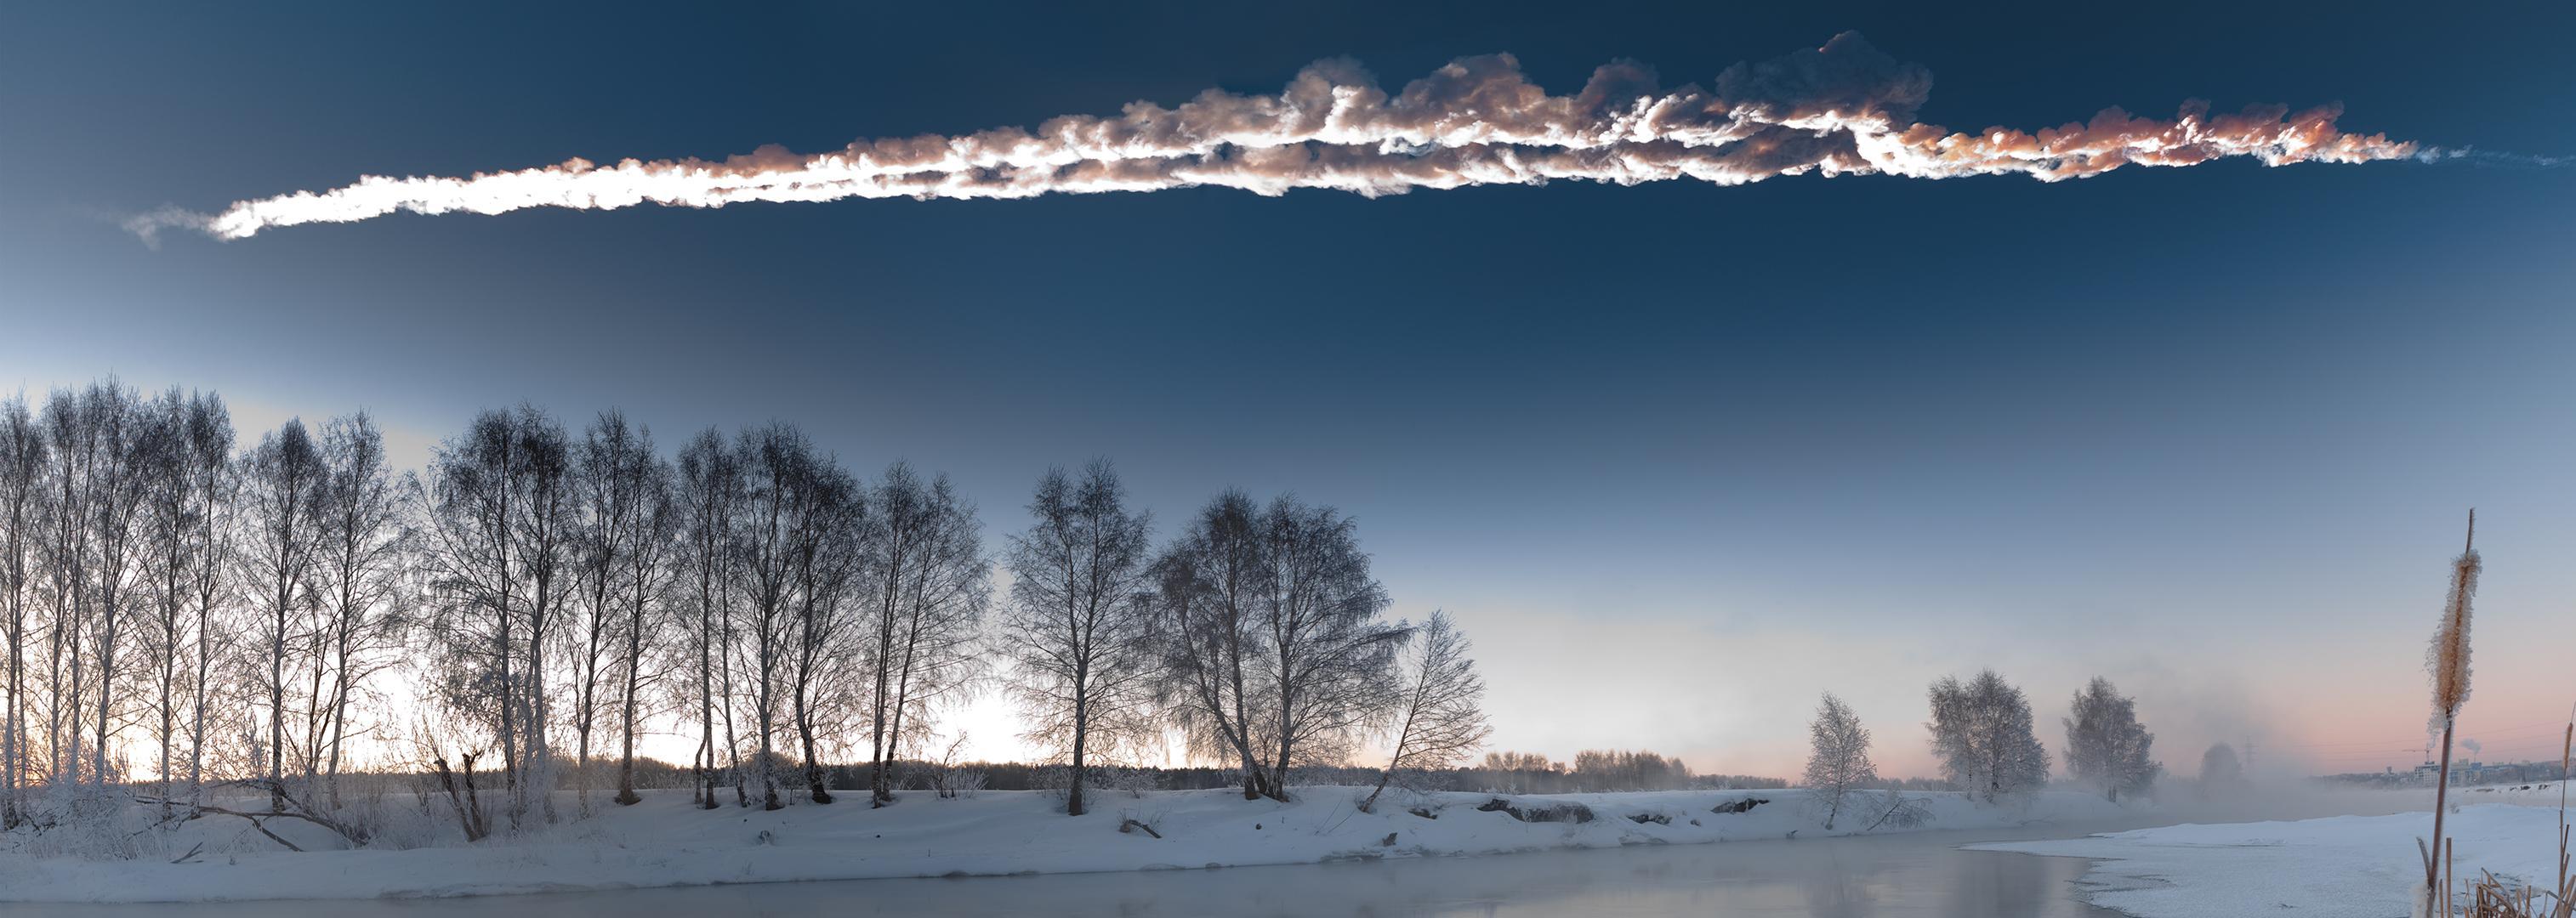 Meteor Chelyabinsk melintas meledak dilangit pada bulan Februari, melukai ratusan orang, merusak bangunan, dan menarik perhatian dunia atas potensi bumi menjadi target tabrakan batu luar angkasa. Sumber : M. Ahmetvaleev